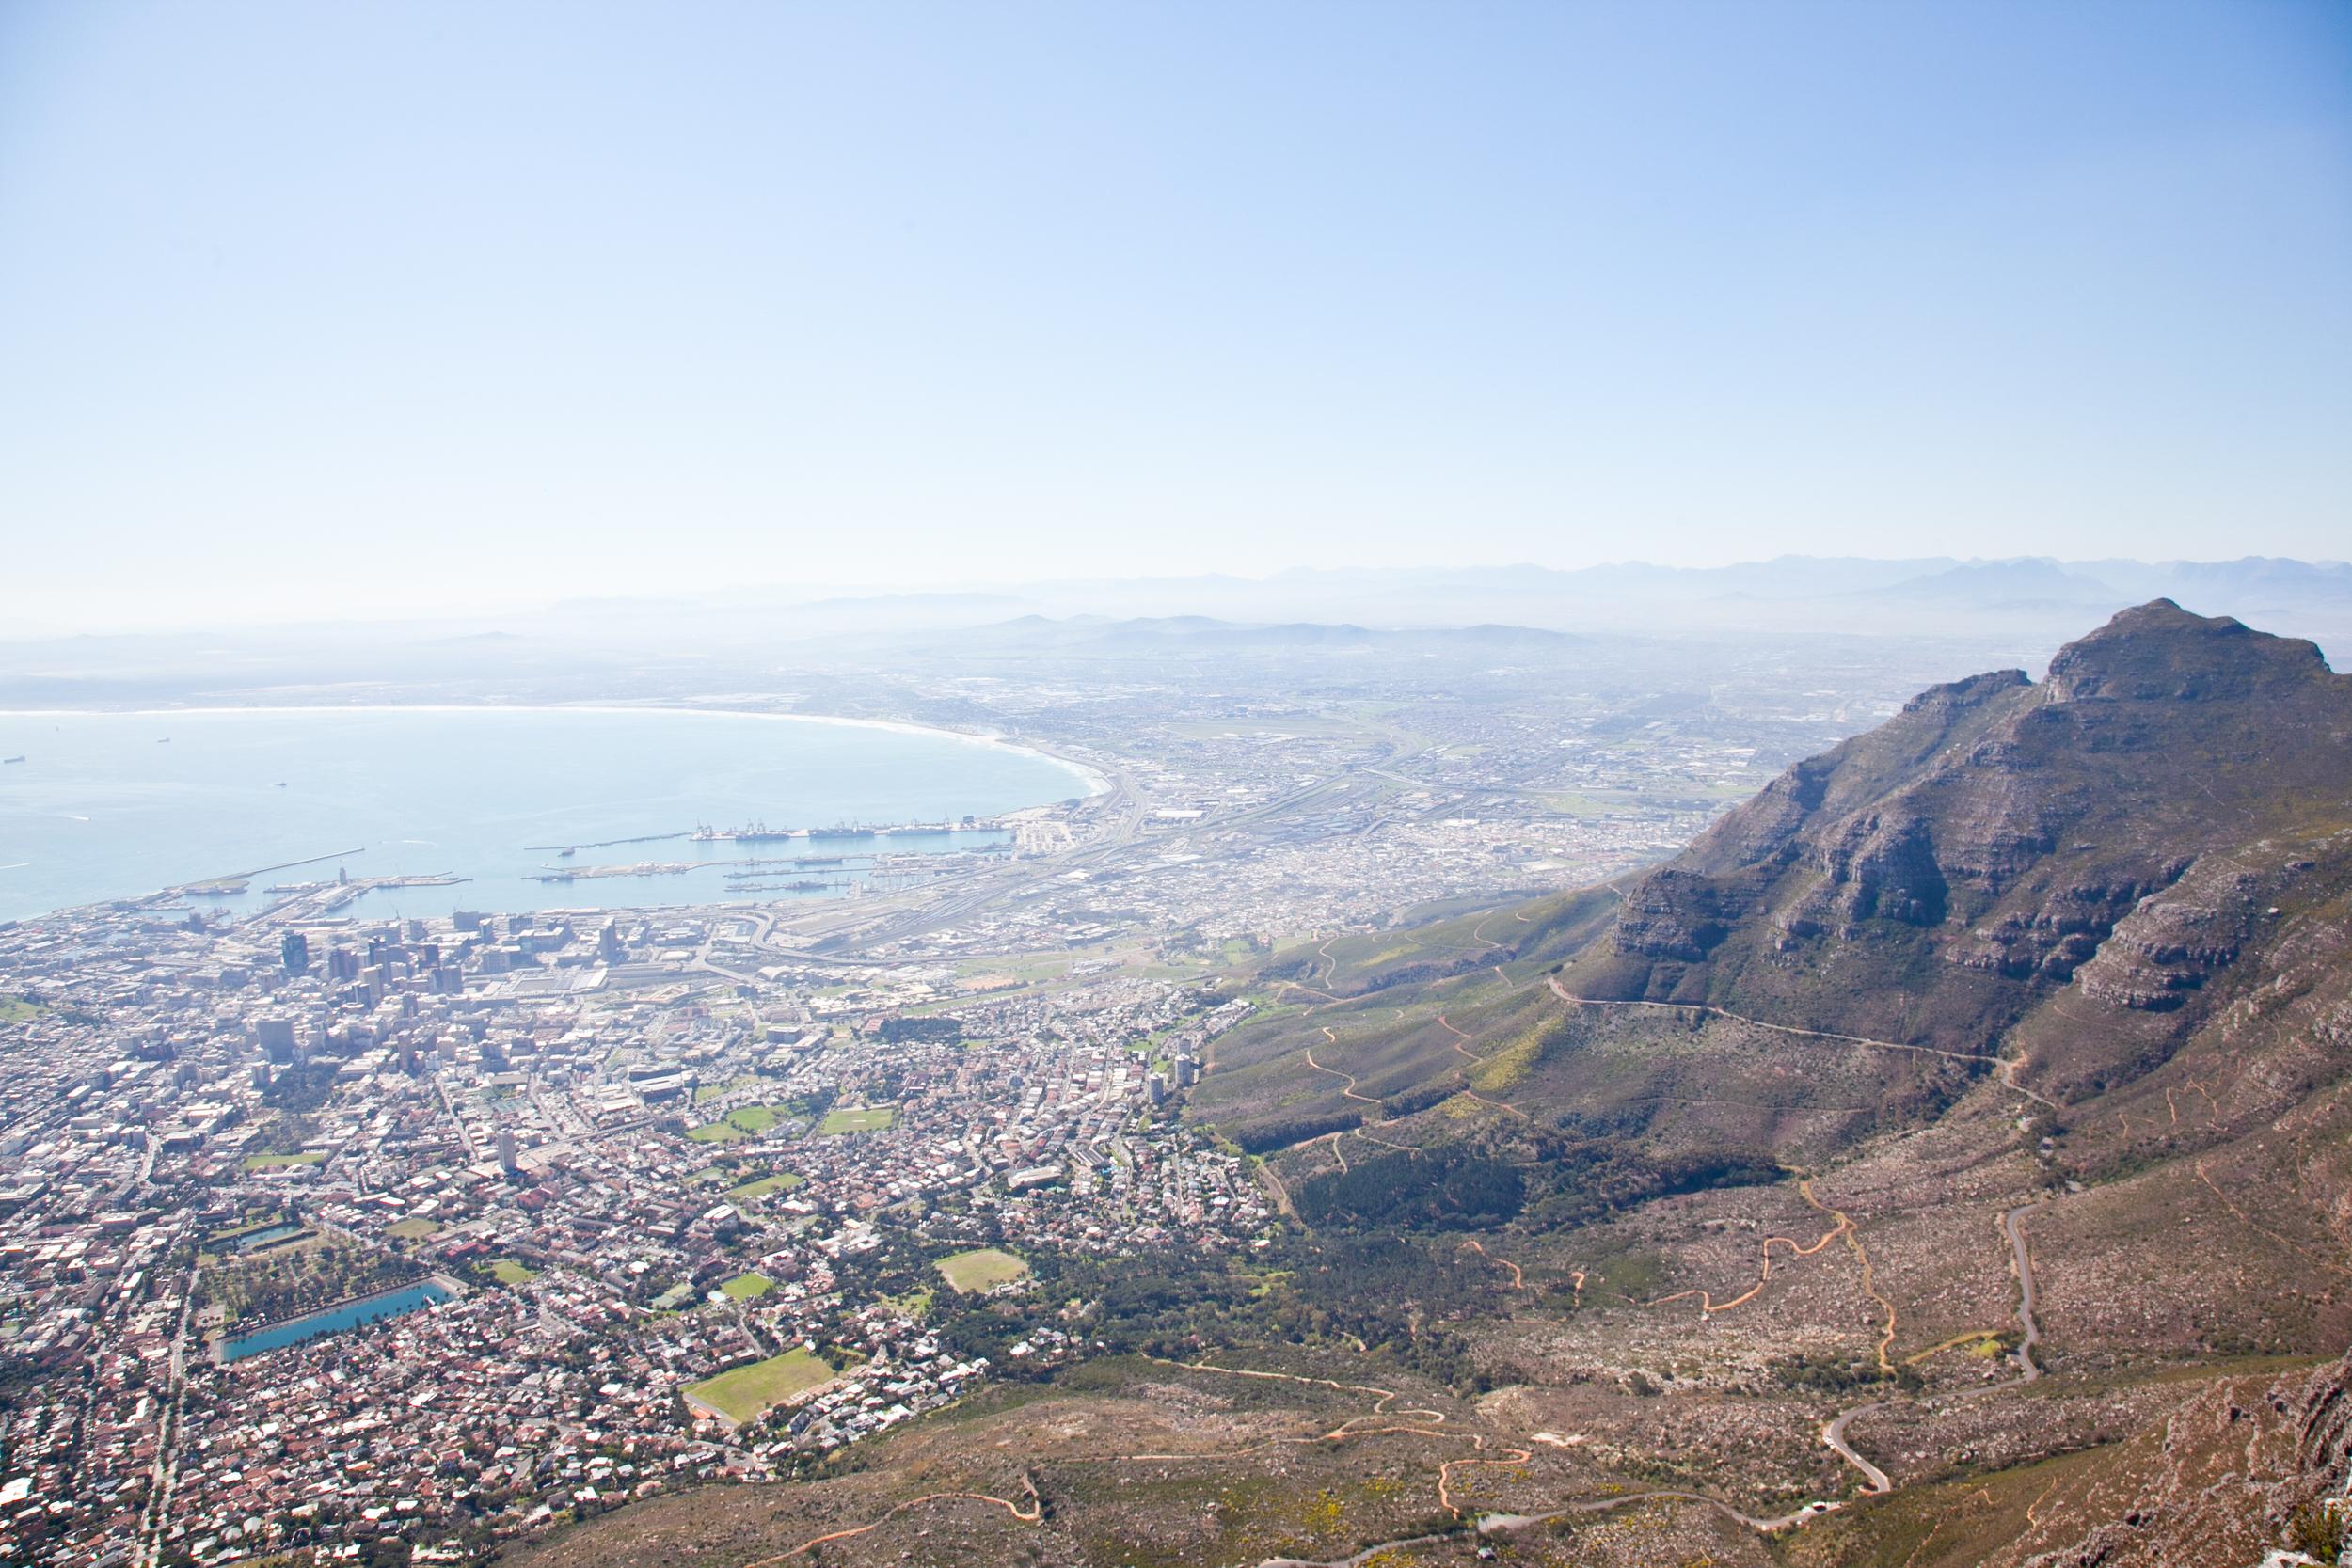 IMG_4660-table-mountain-cape-town-south-africa-trisa-taro.jpg